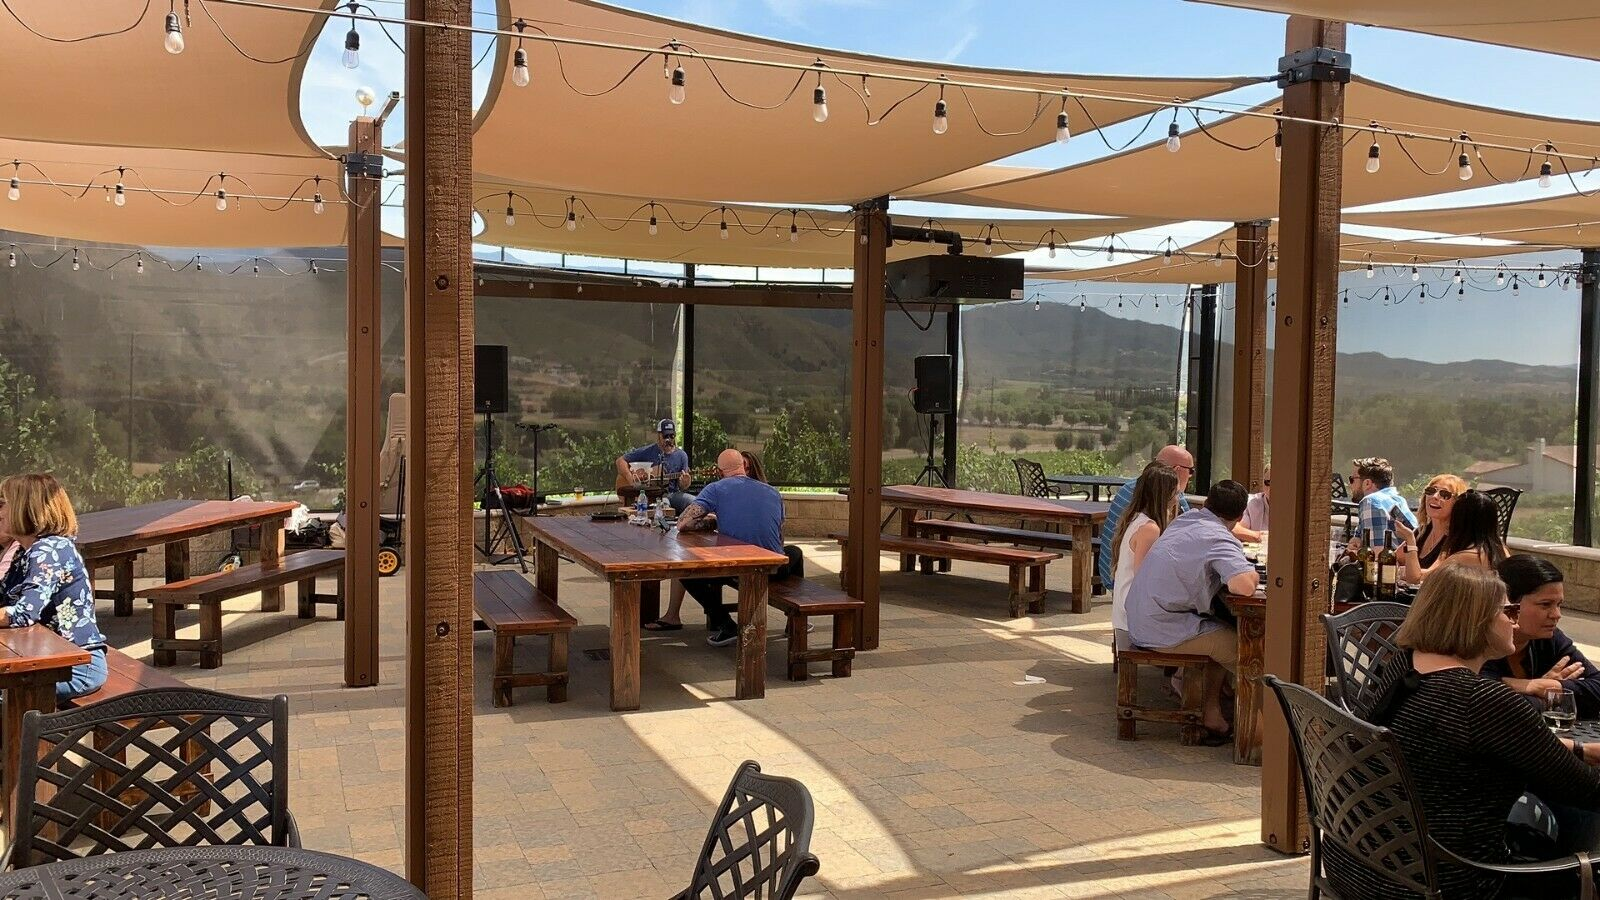 Patio Sun Shade Canopy UV Block Outdoor Cover for Backyard G